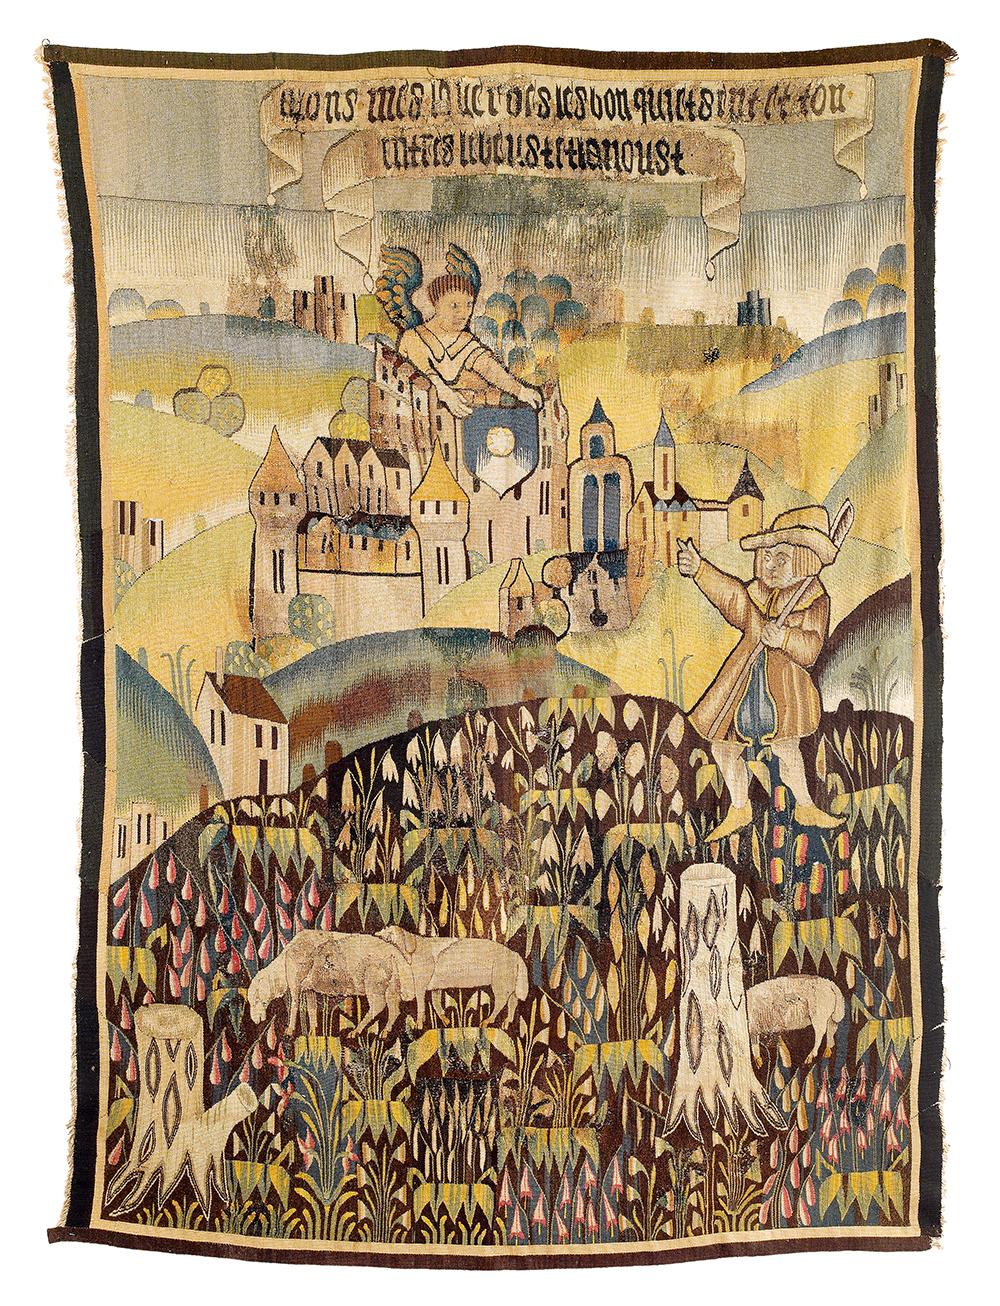 Tapisserie de la Marche, Tapestry, Central France, Limousin region, 16th century, 234 x 174 cm, estimate € 4,000